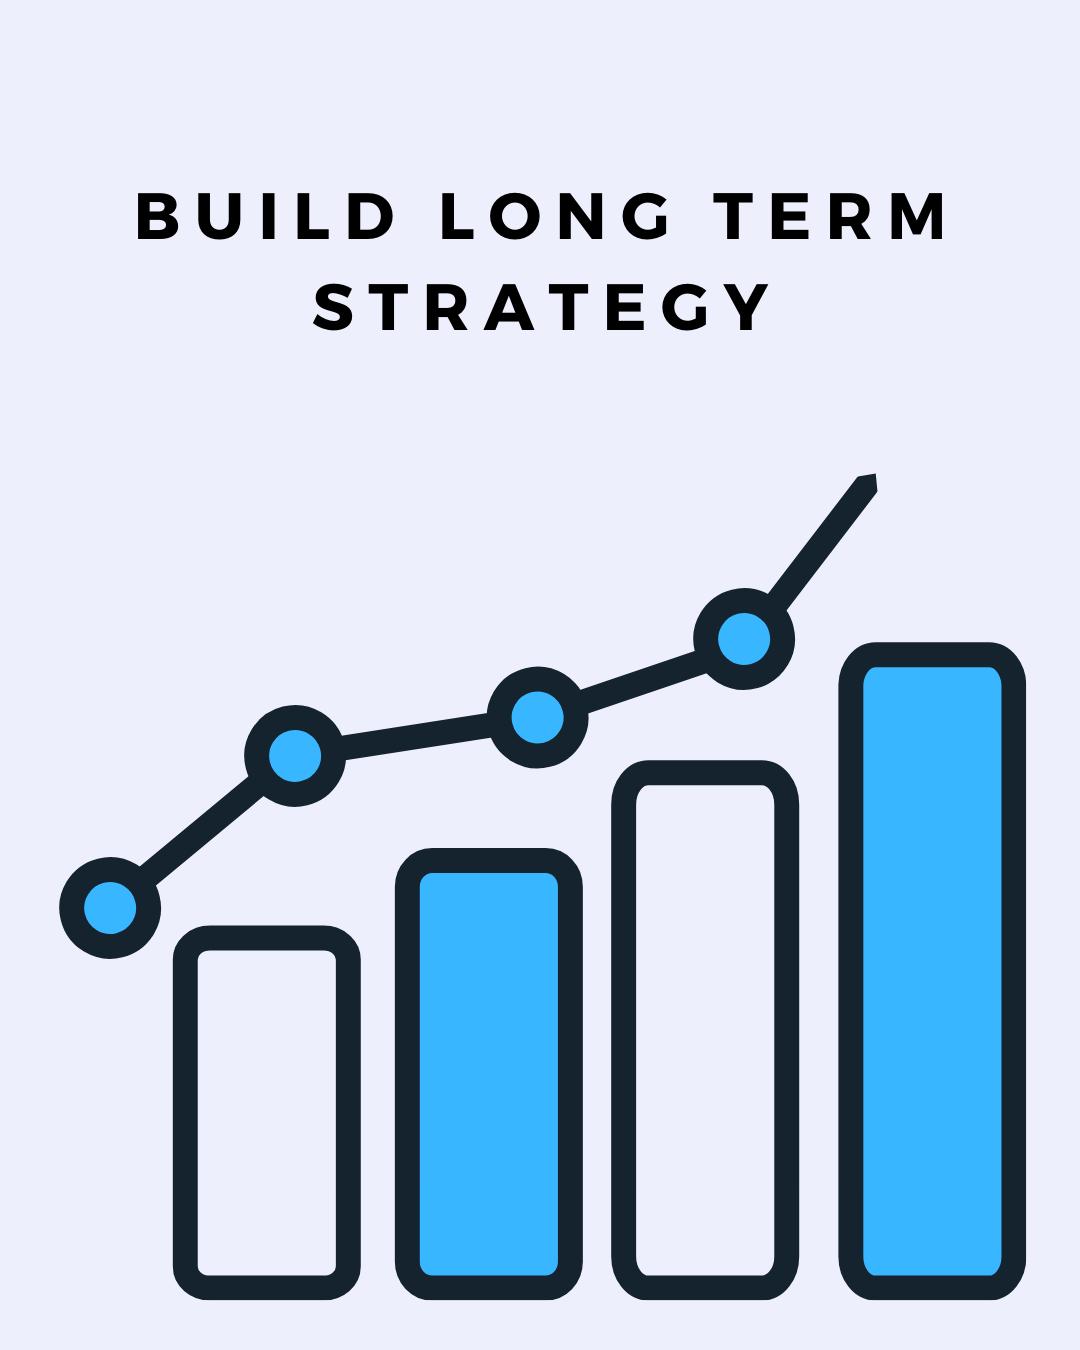 Build long term strategy